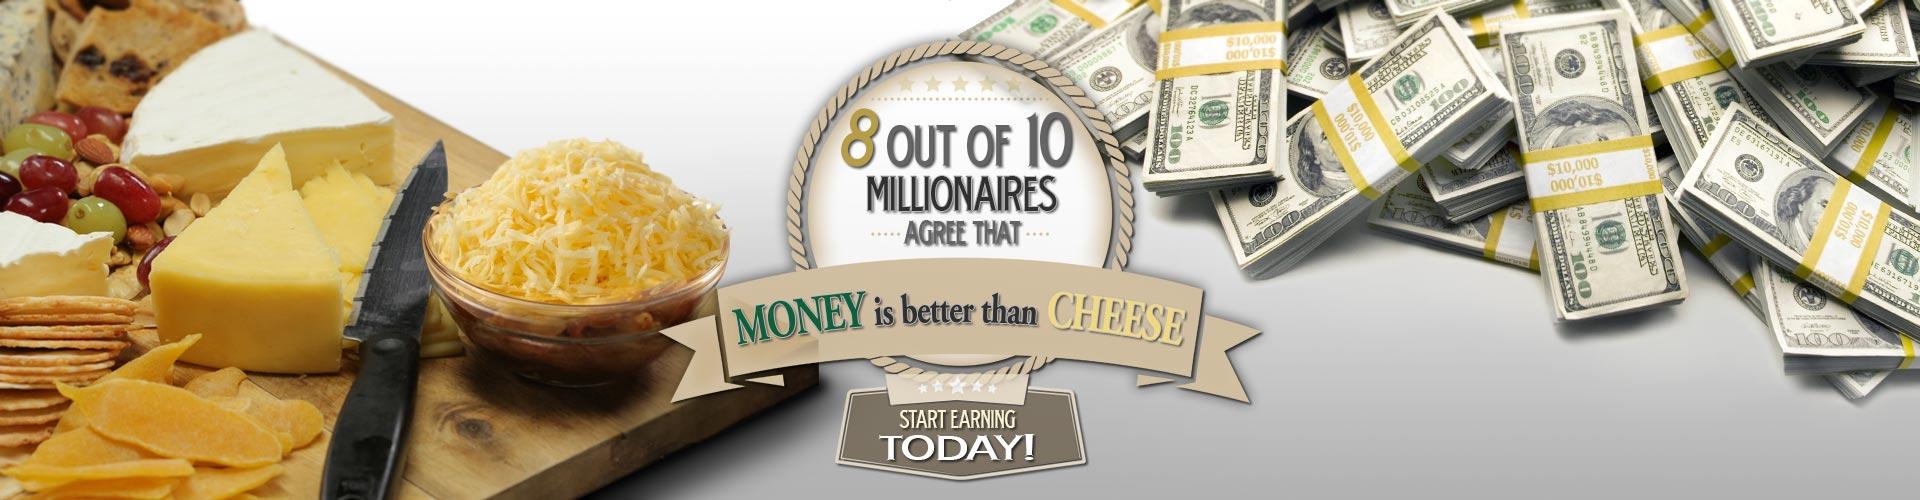 cheese-money